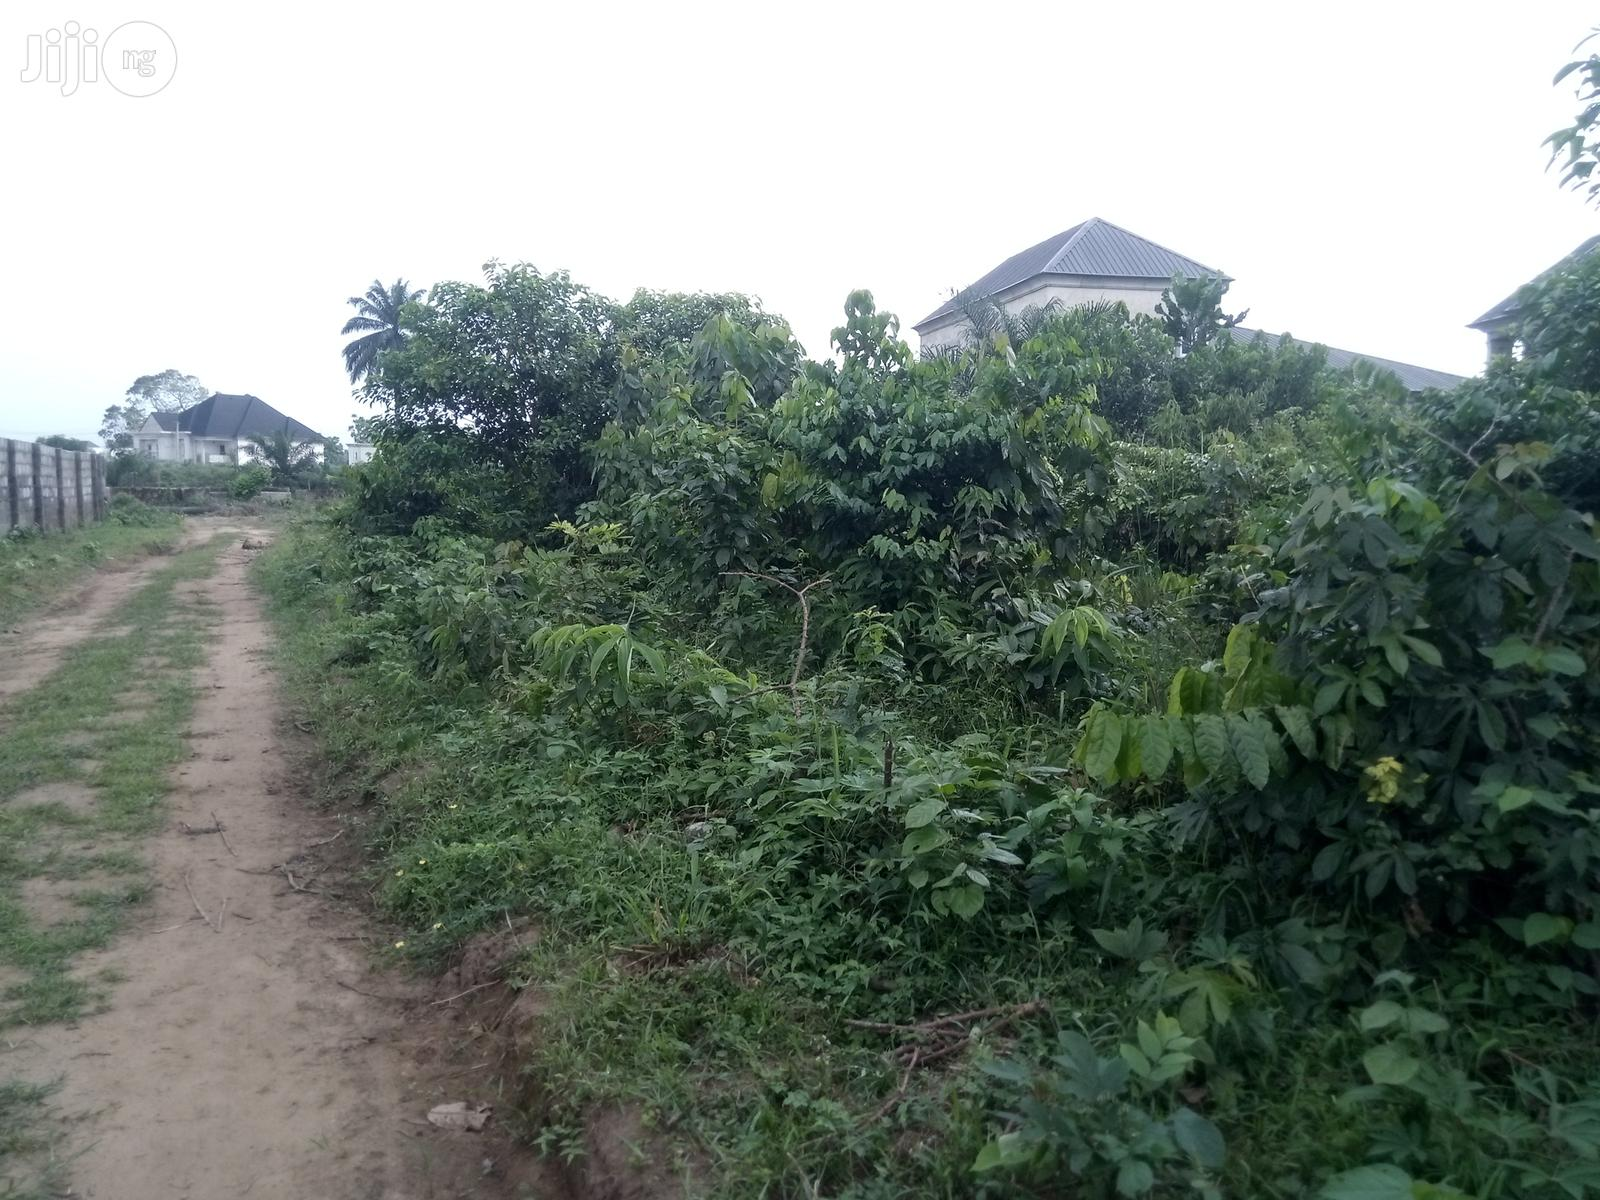 For Sale: One Plot of Land at Odani, Port Harcourt